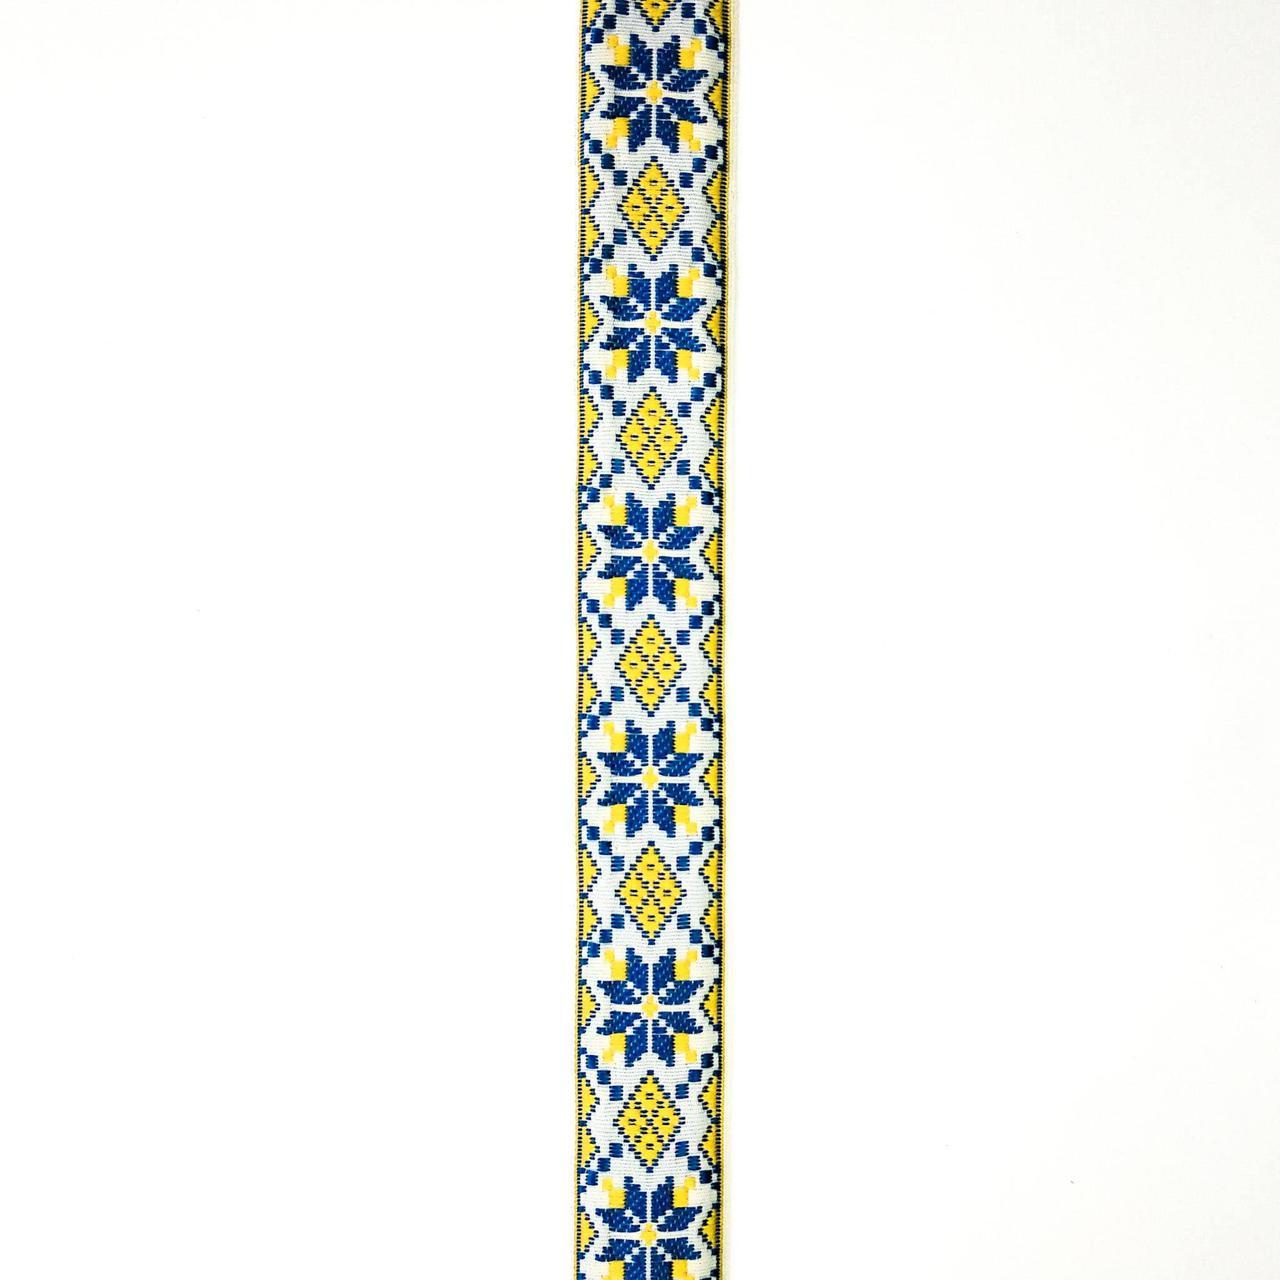 Лента отделочная с украинским орнаментом 23 мм (25м/рулон)